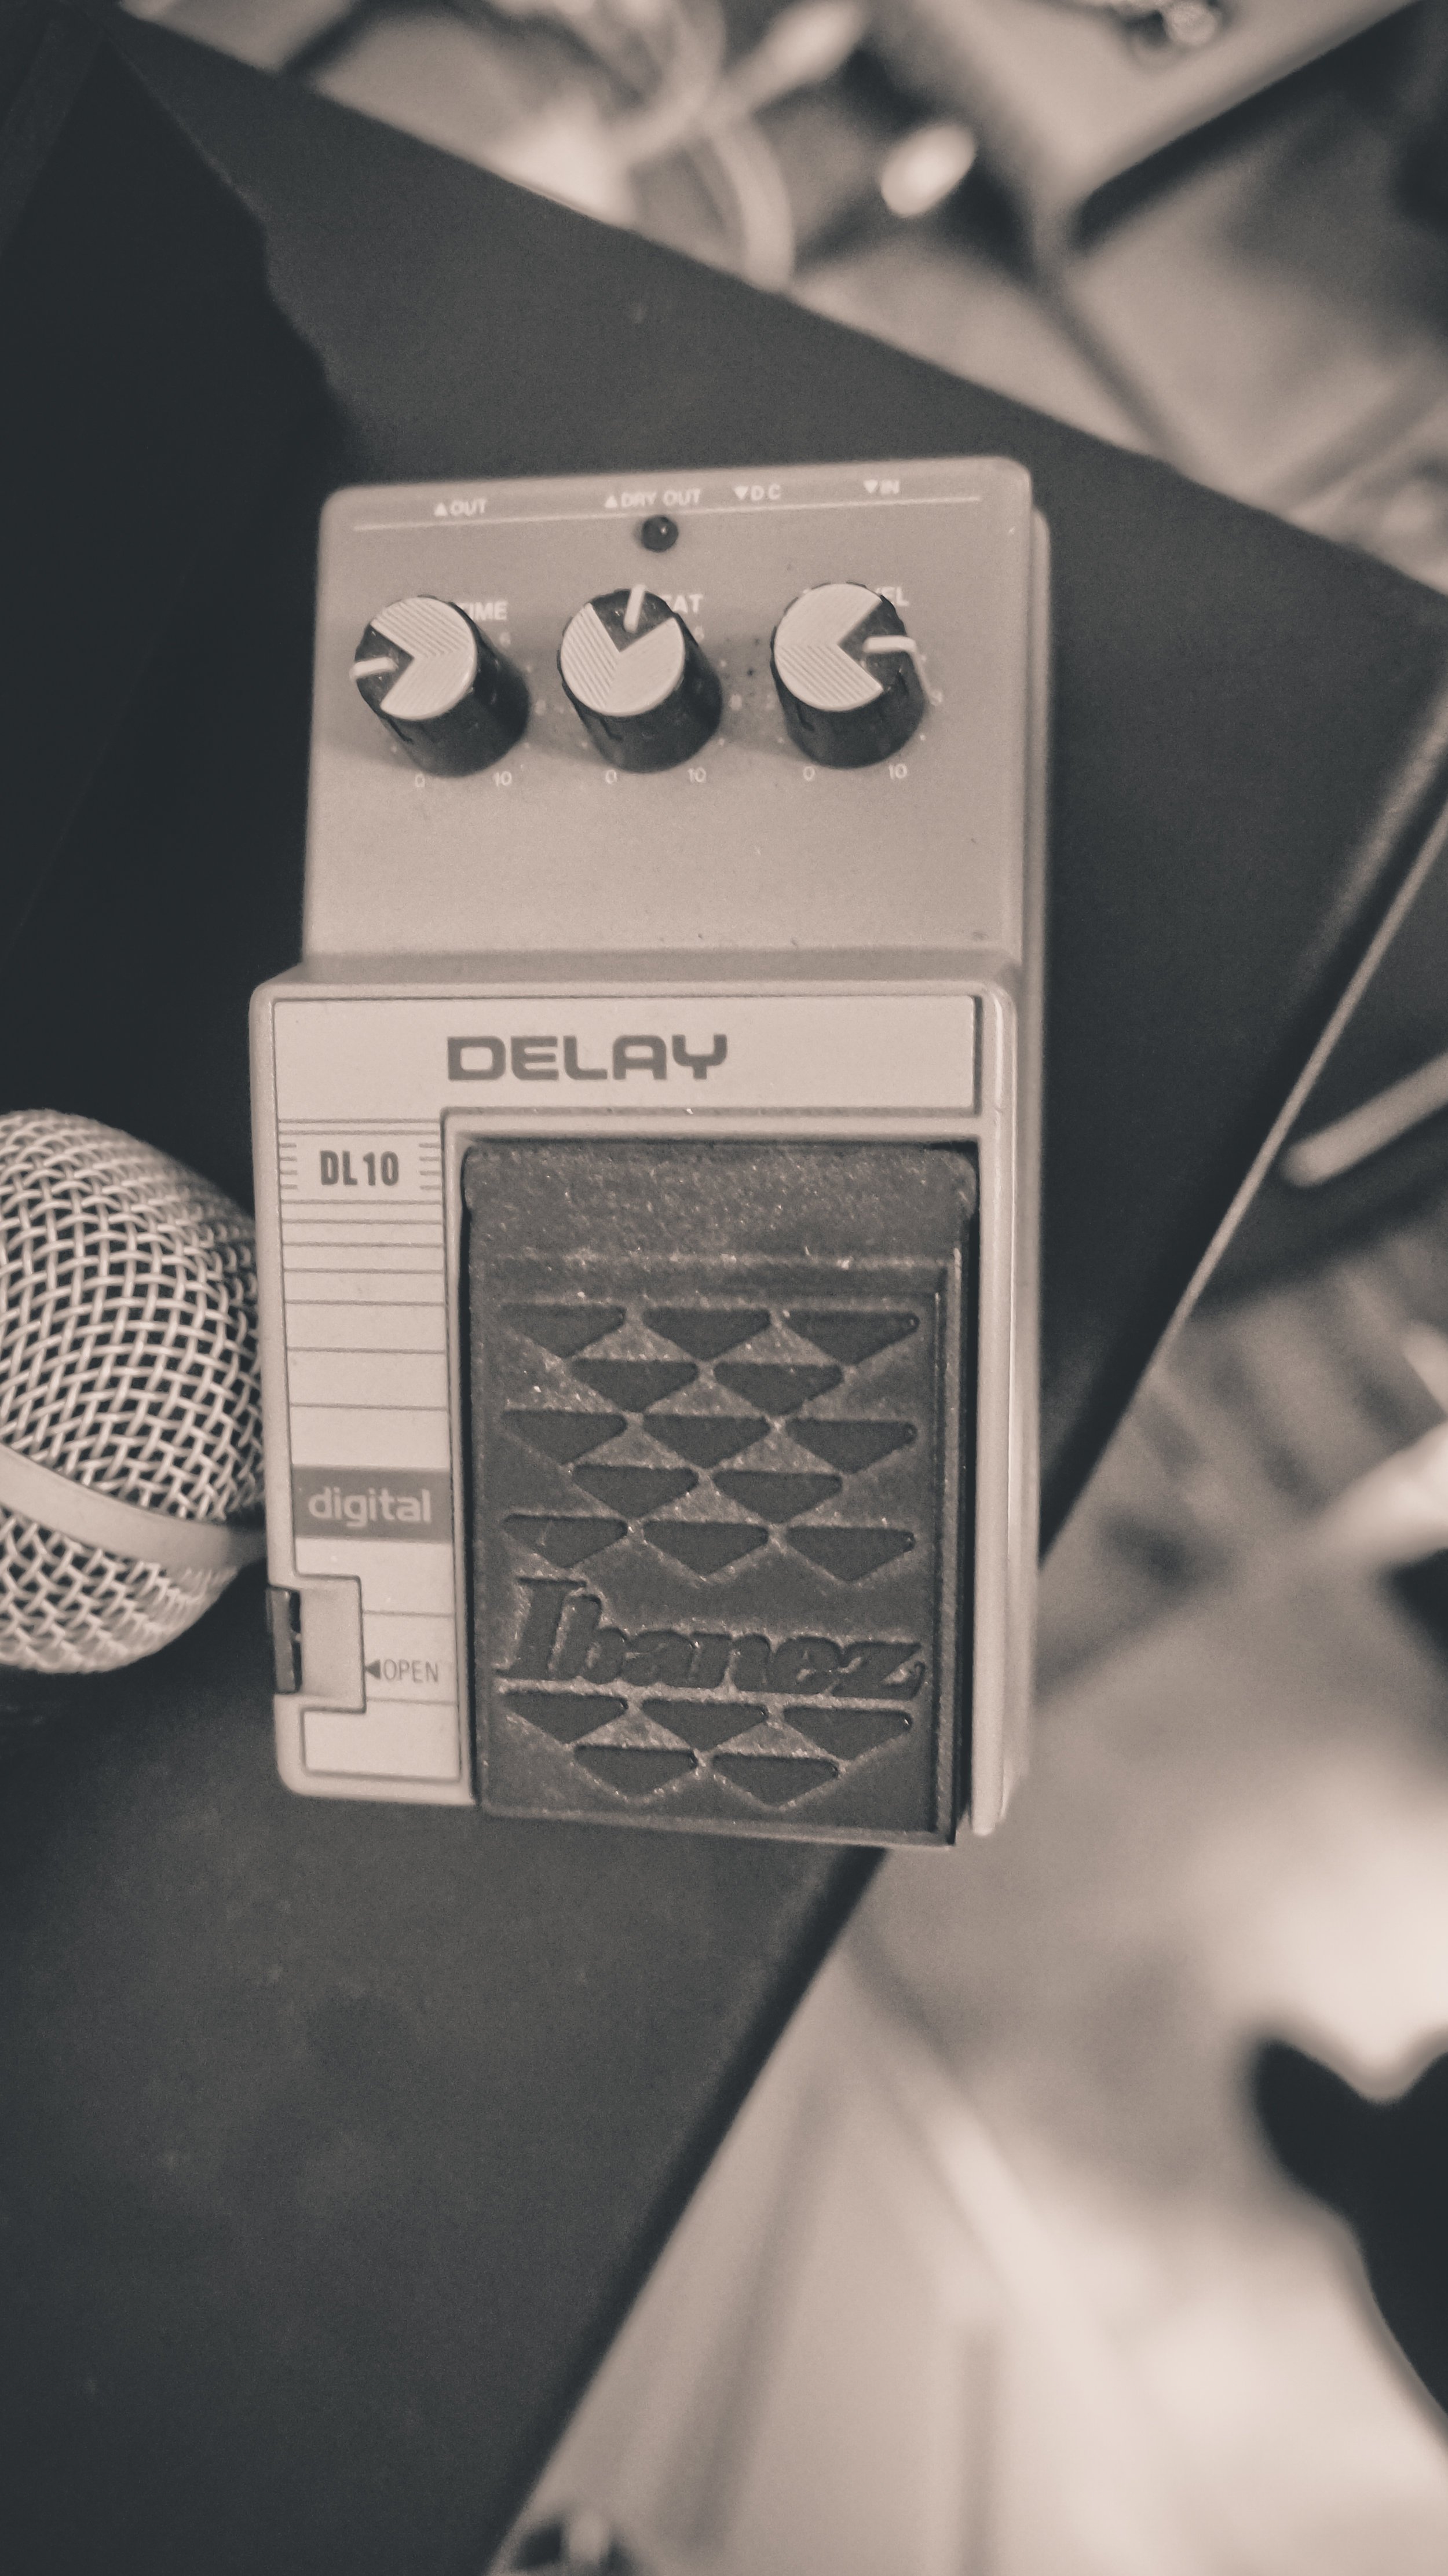 IMUR delay pedal